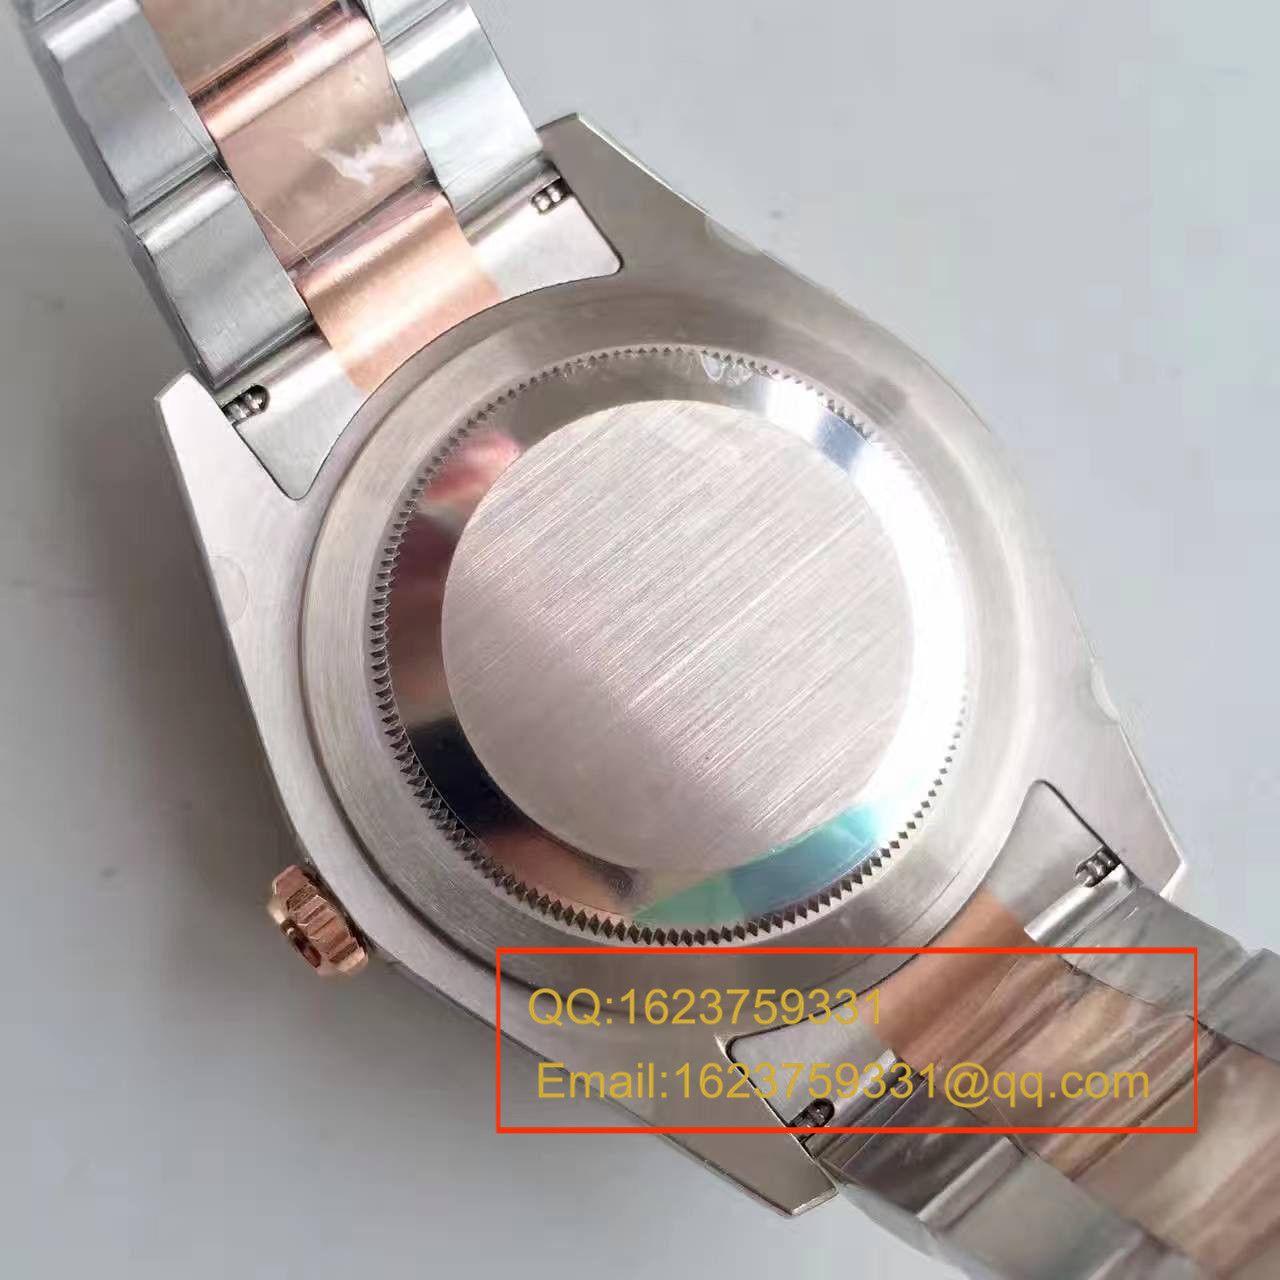 【NOOB厂一比一高仿手表】劳力士日志型系列126331粉盘镶钻腕表 / R164